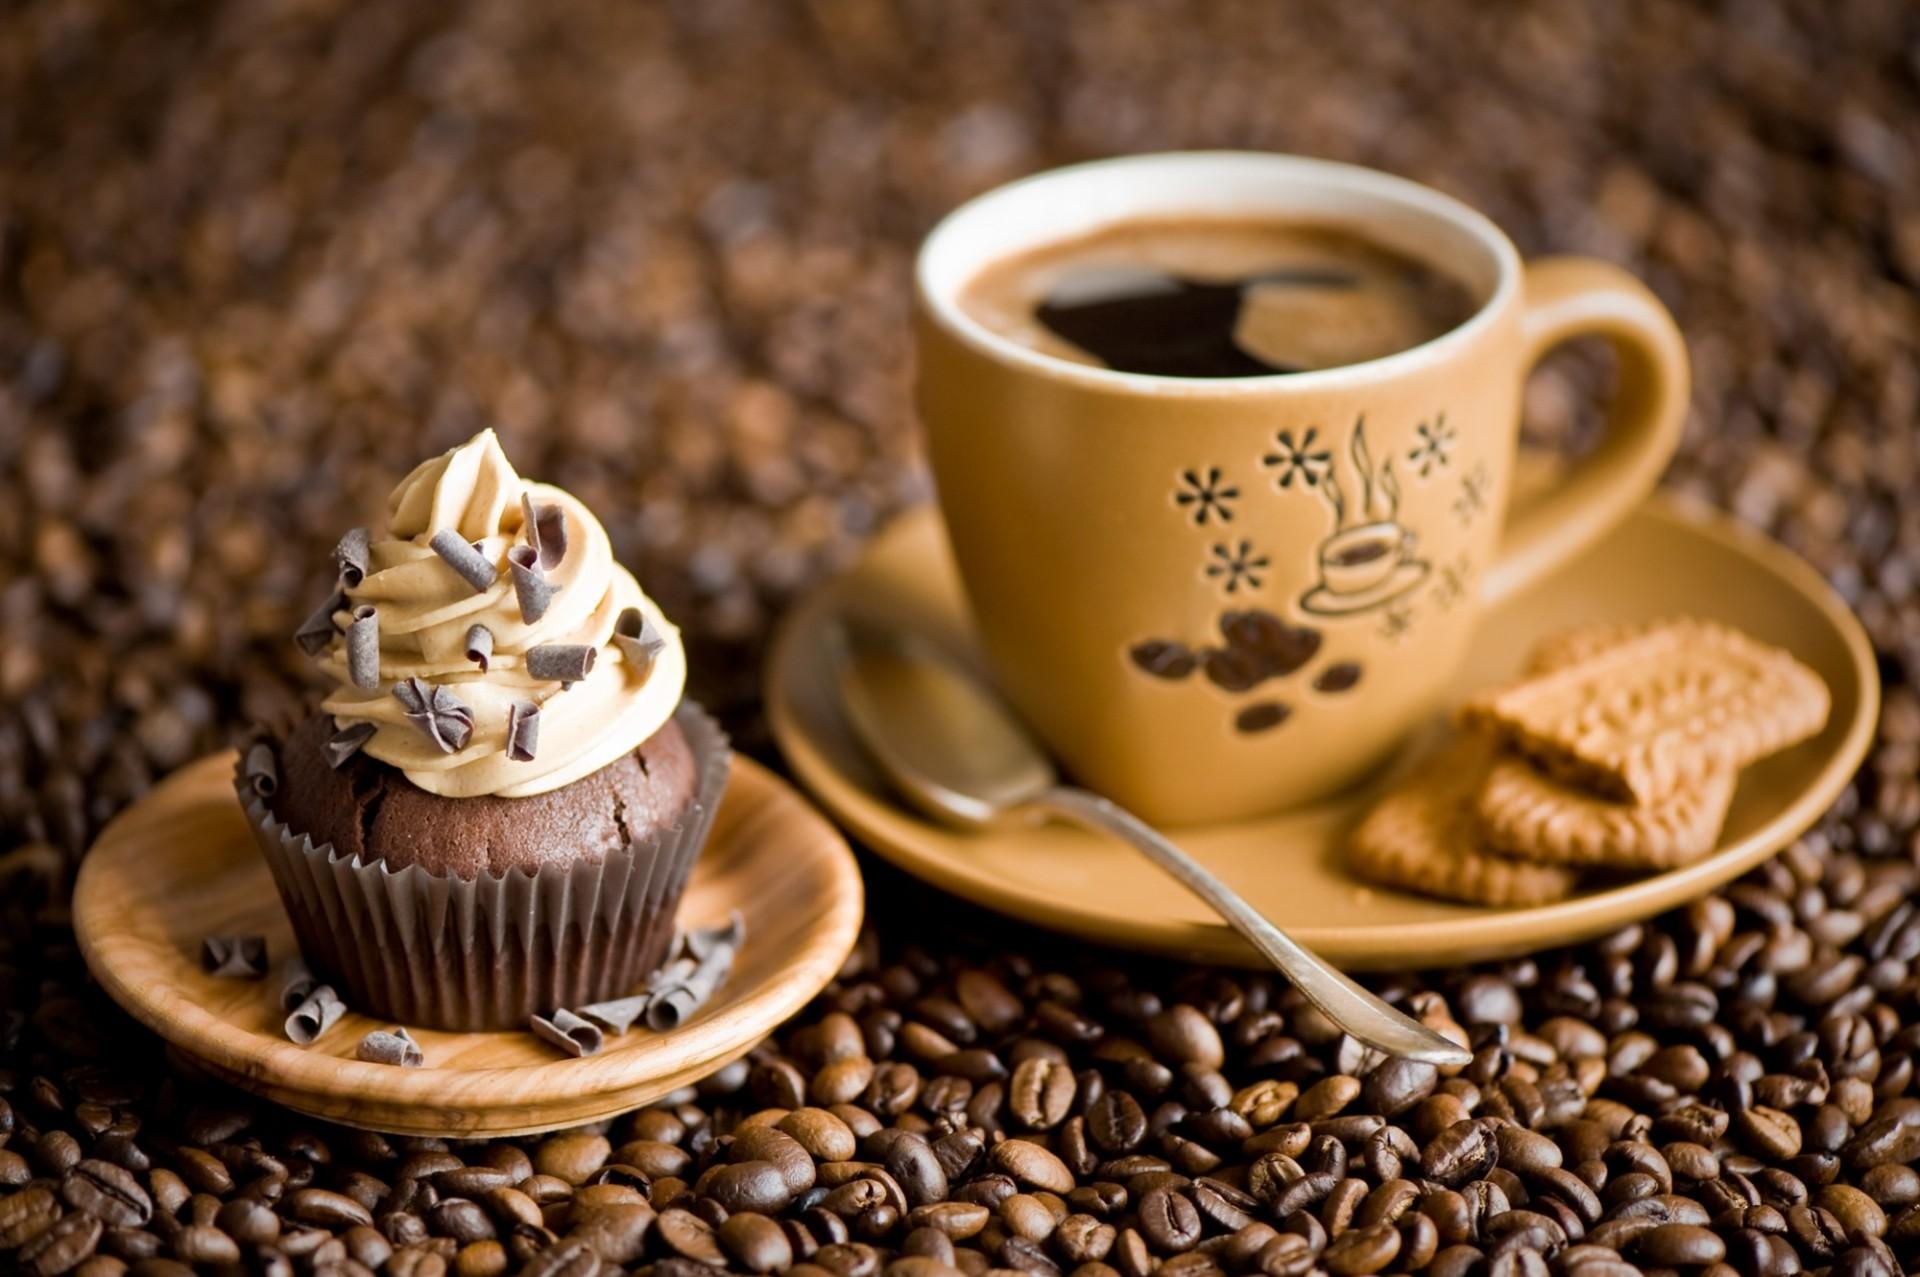 cupcake cafe business proposal